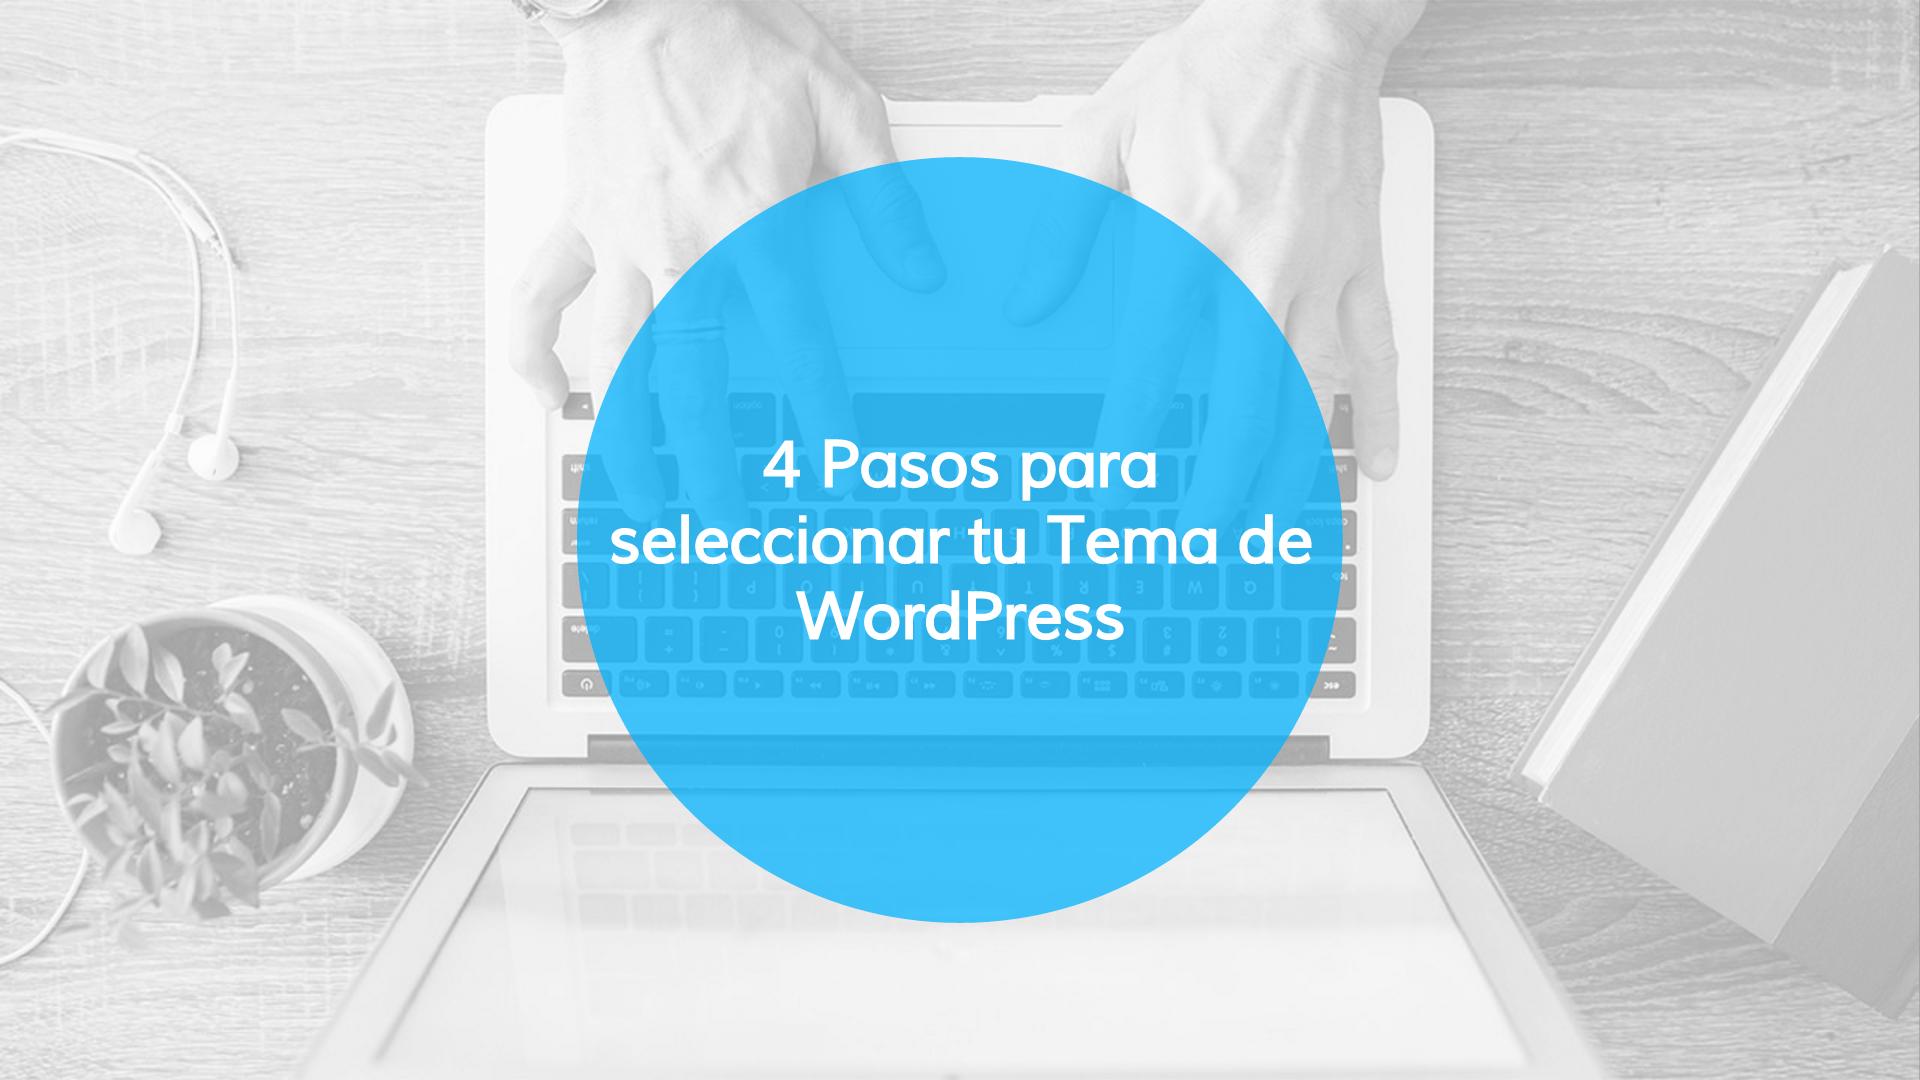 4 pasos para seleccionar tu tema de WordPress